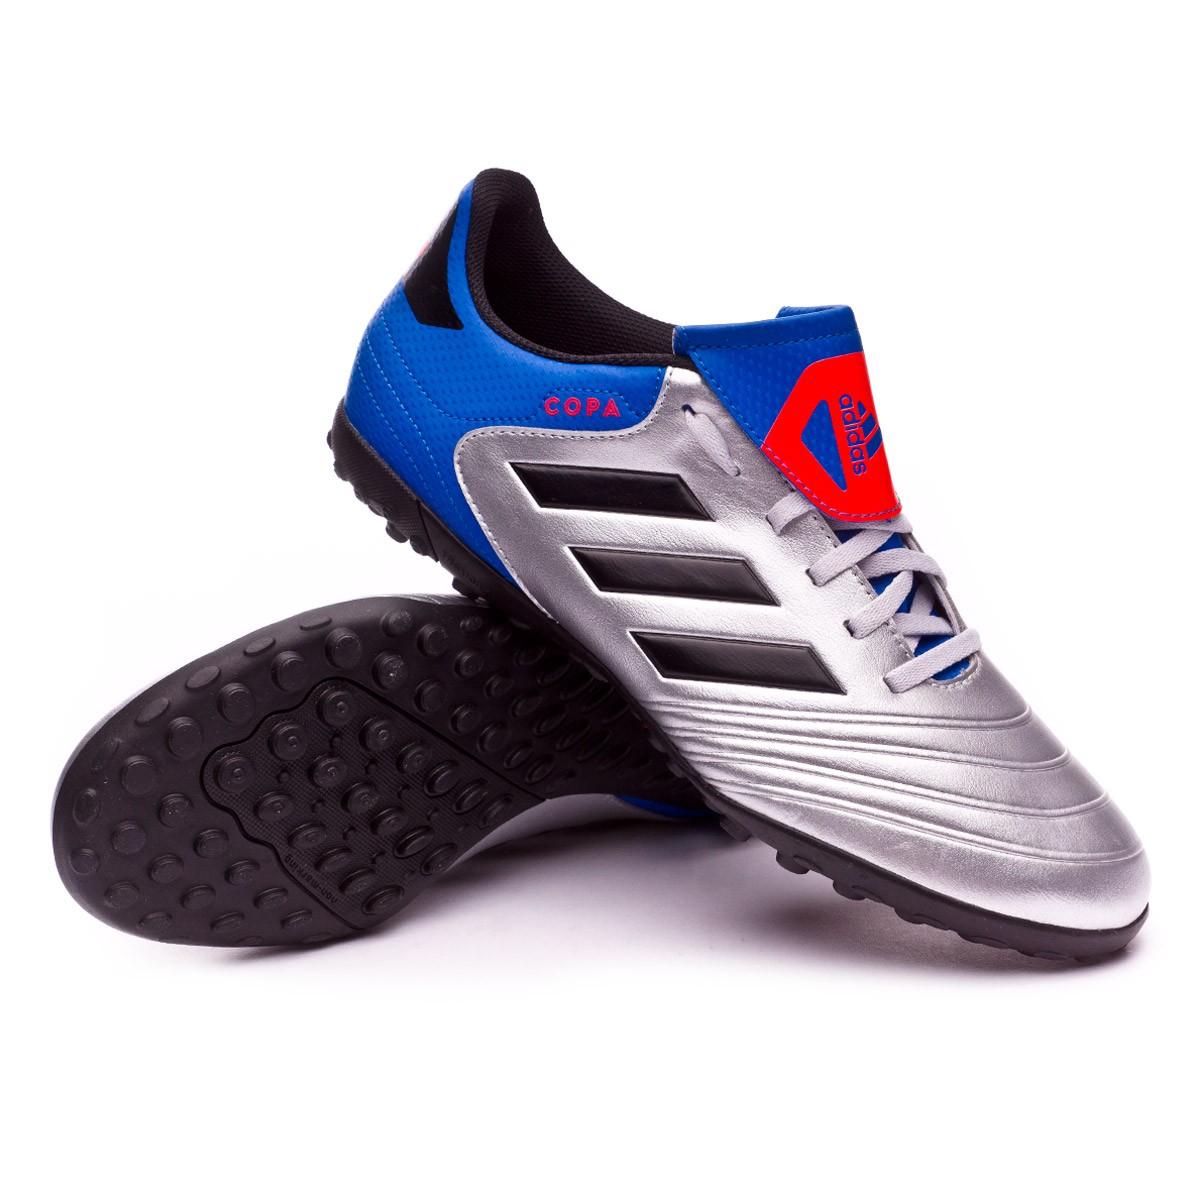 f5fec91a5c2b adidas Copa Tango 18.4 Turf Football Boot. Silver metallic-Core black- Football ...